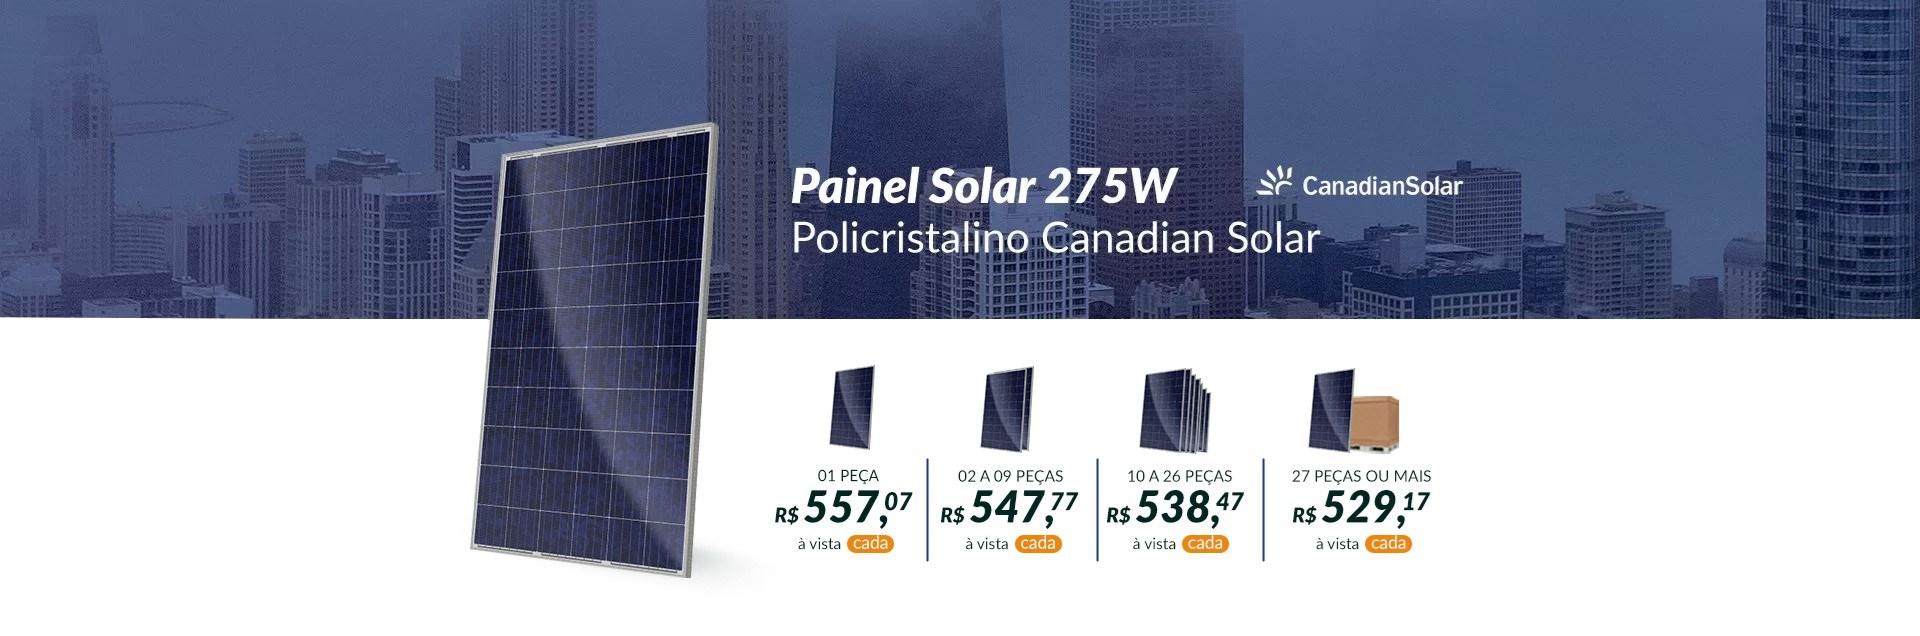 Painel Solar 275W Canadian Solar